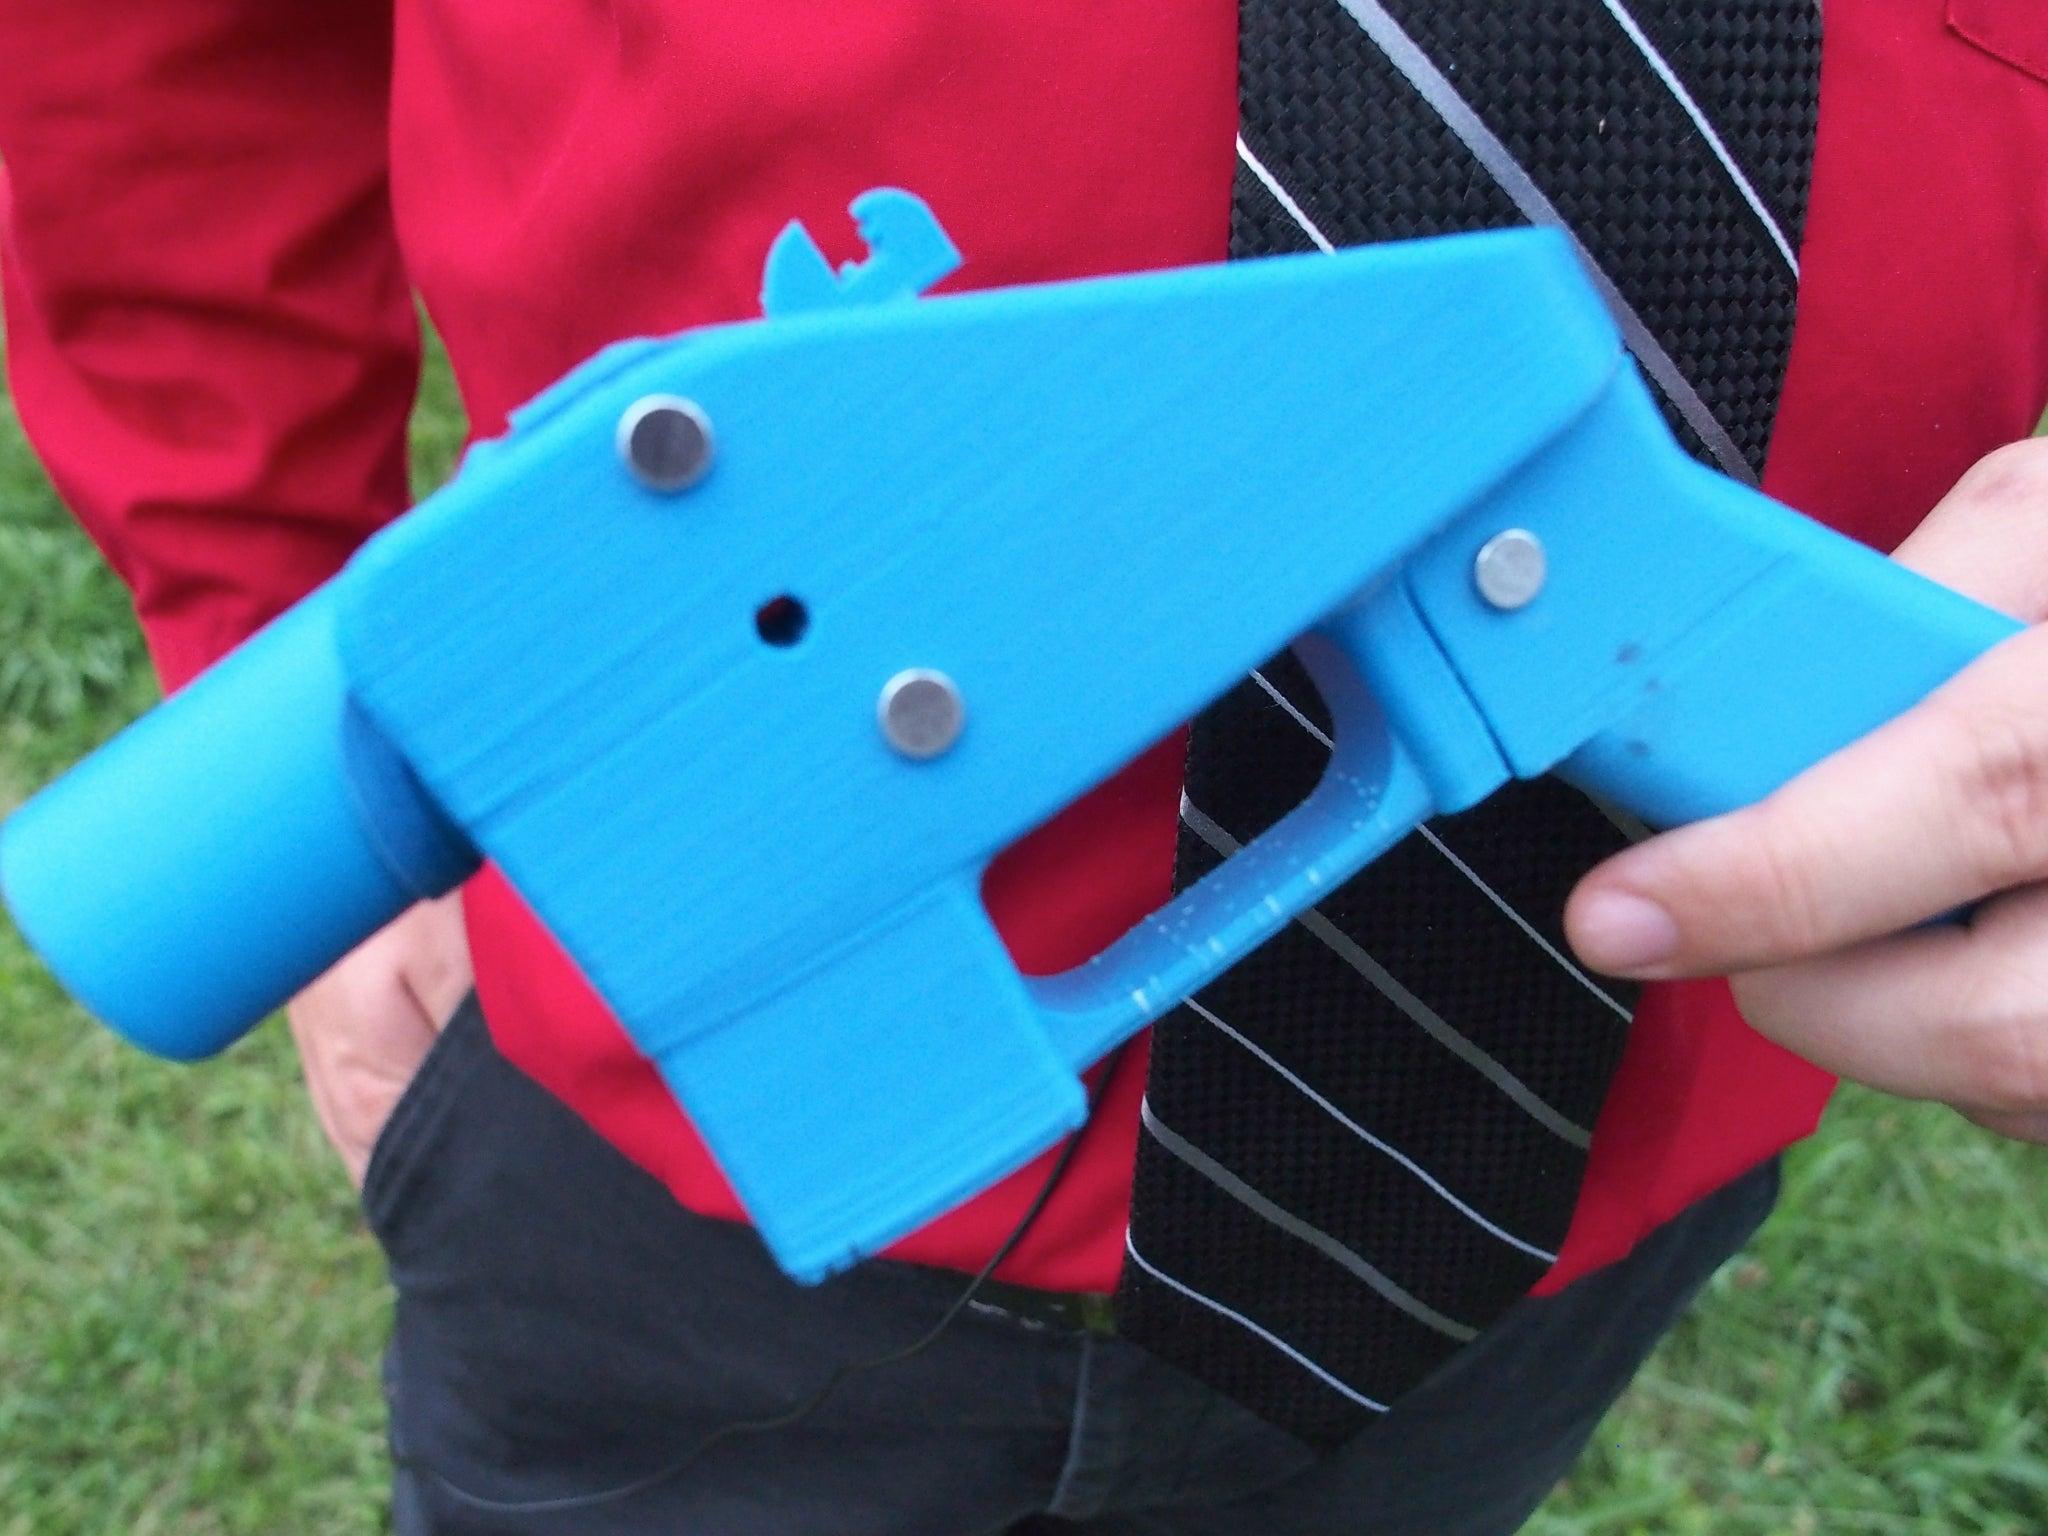 Trump administration allows Americans to print 3D guns beginning next month